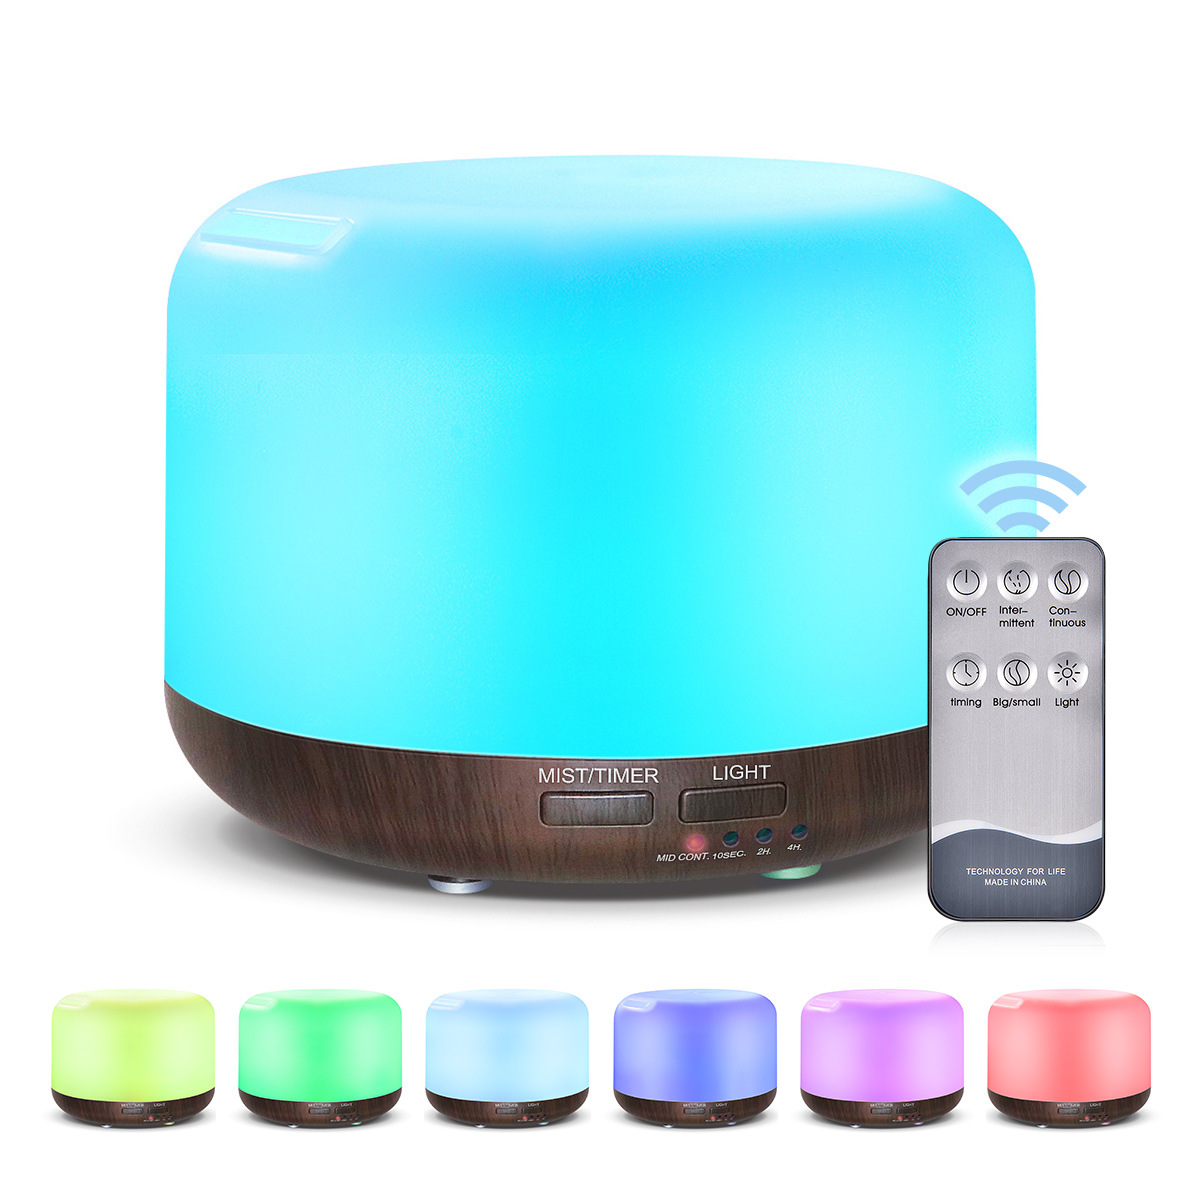 300ml Remote Control Wood Grain Household Fragrance Lamp Ultrasonic Mute Humidifier Deep wood grain remote control_UK Plug